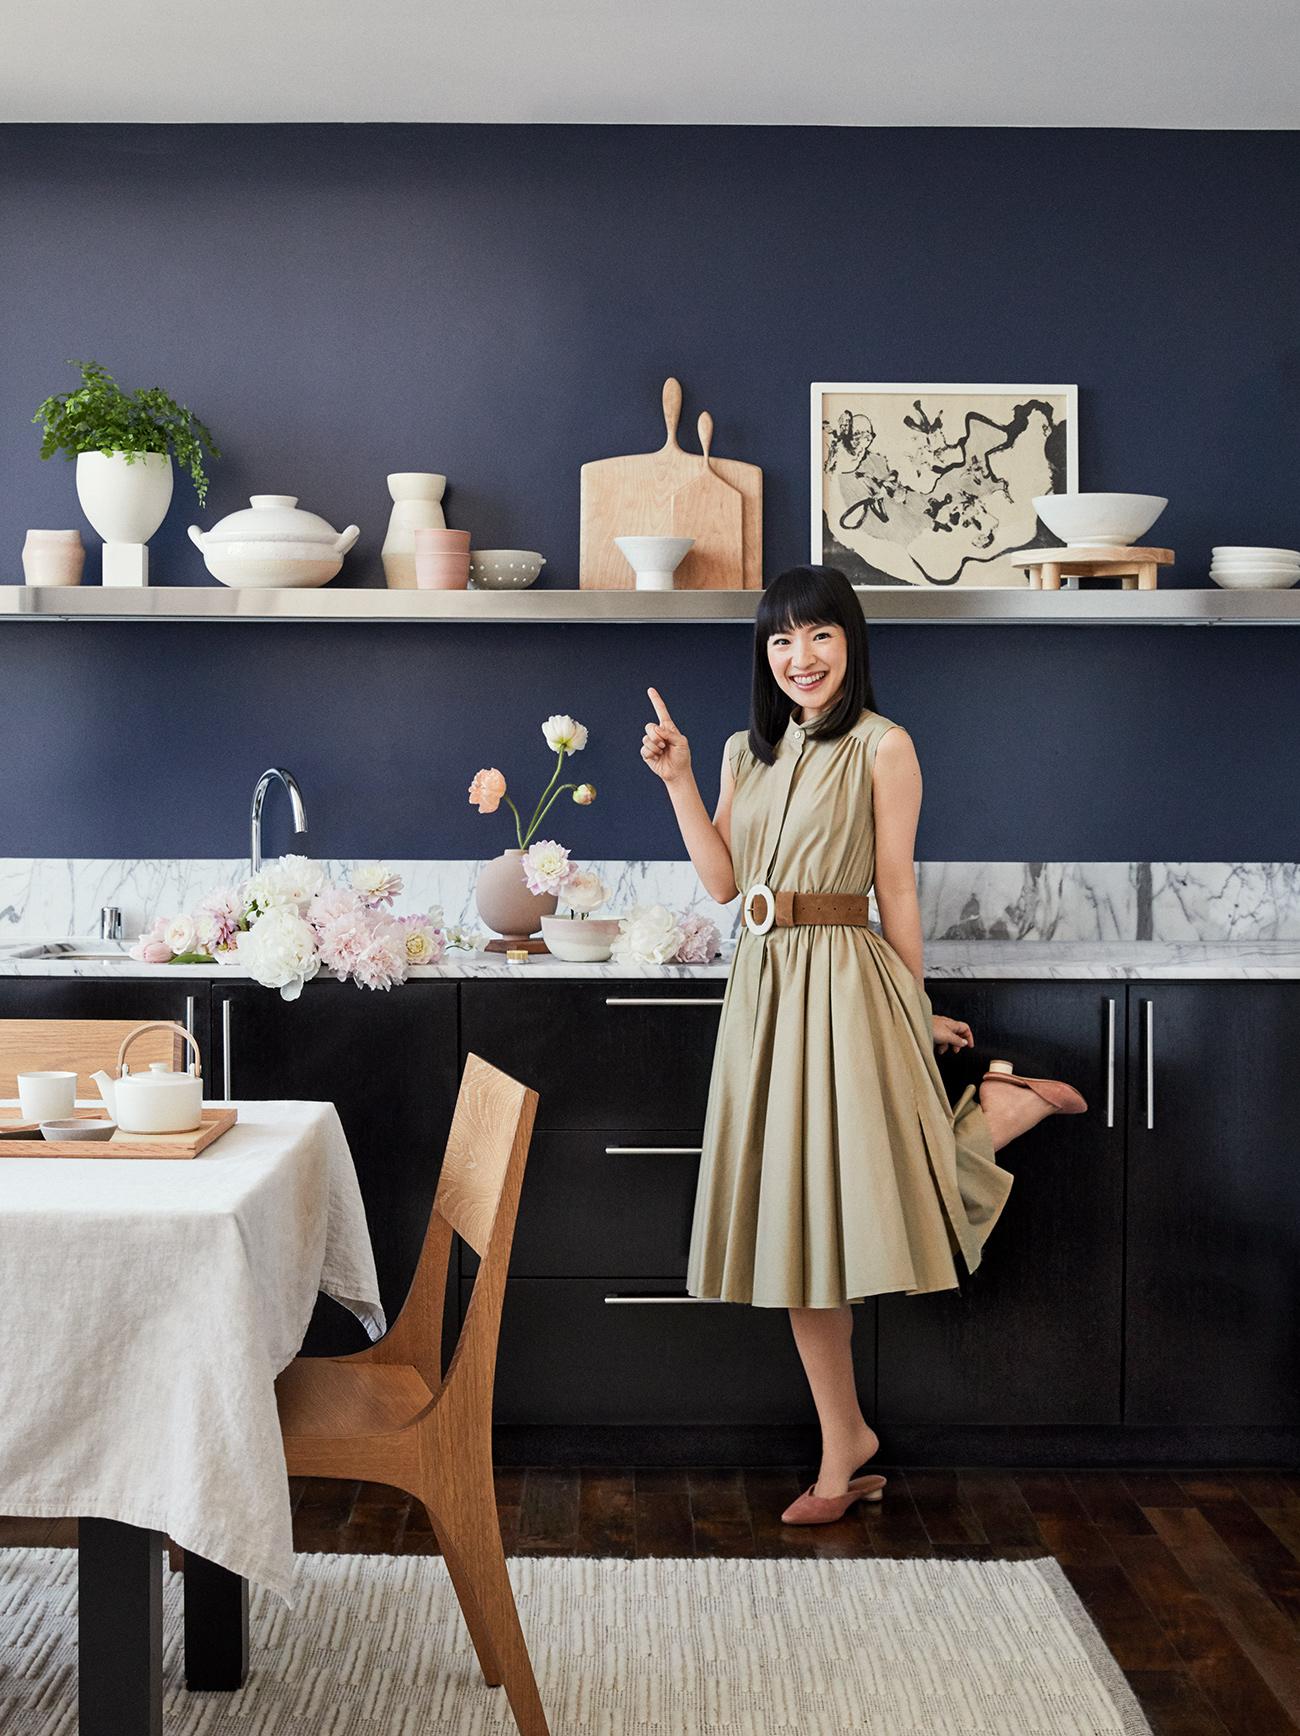 woman-showcasing-home-decor-ff9e6114.jpg